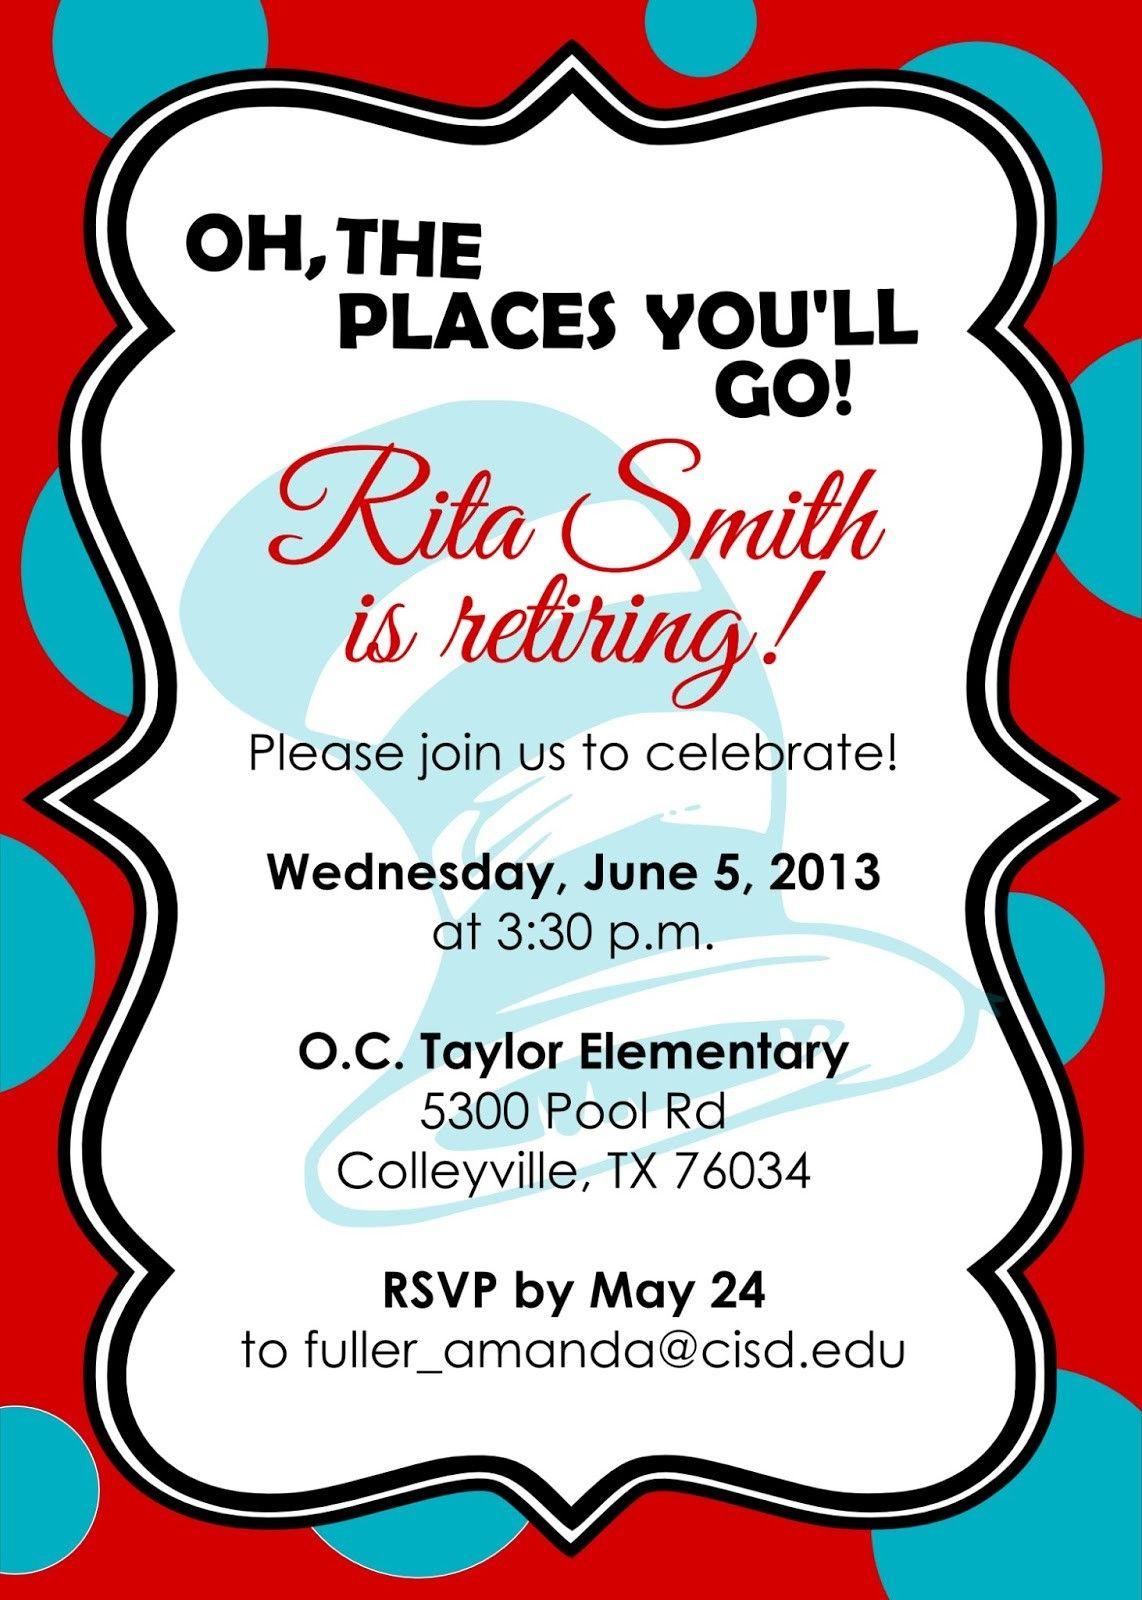 Retirement Party Invitations Free Templates   Fun Stuff   Pinterest - Free Printable Retirement Cards